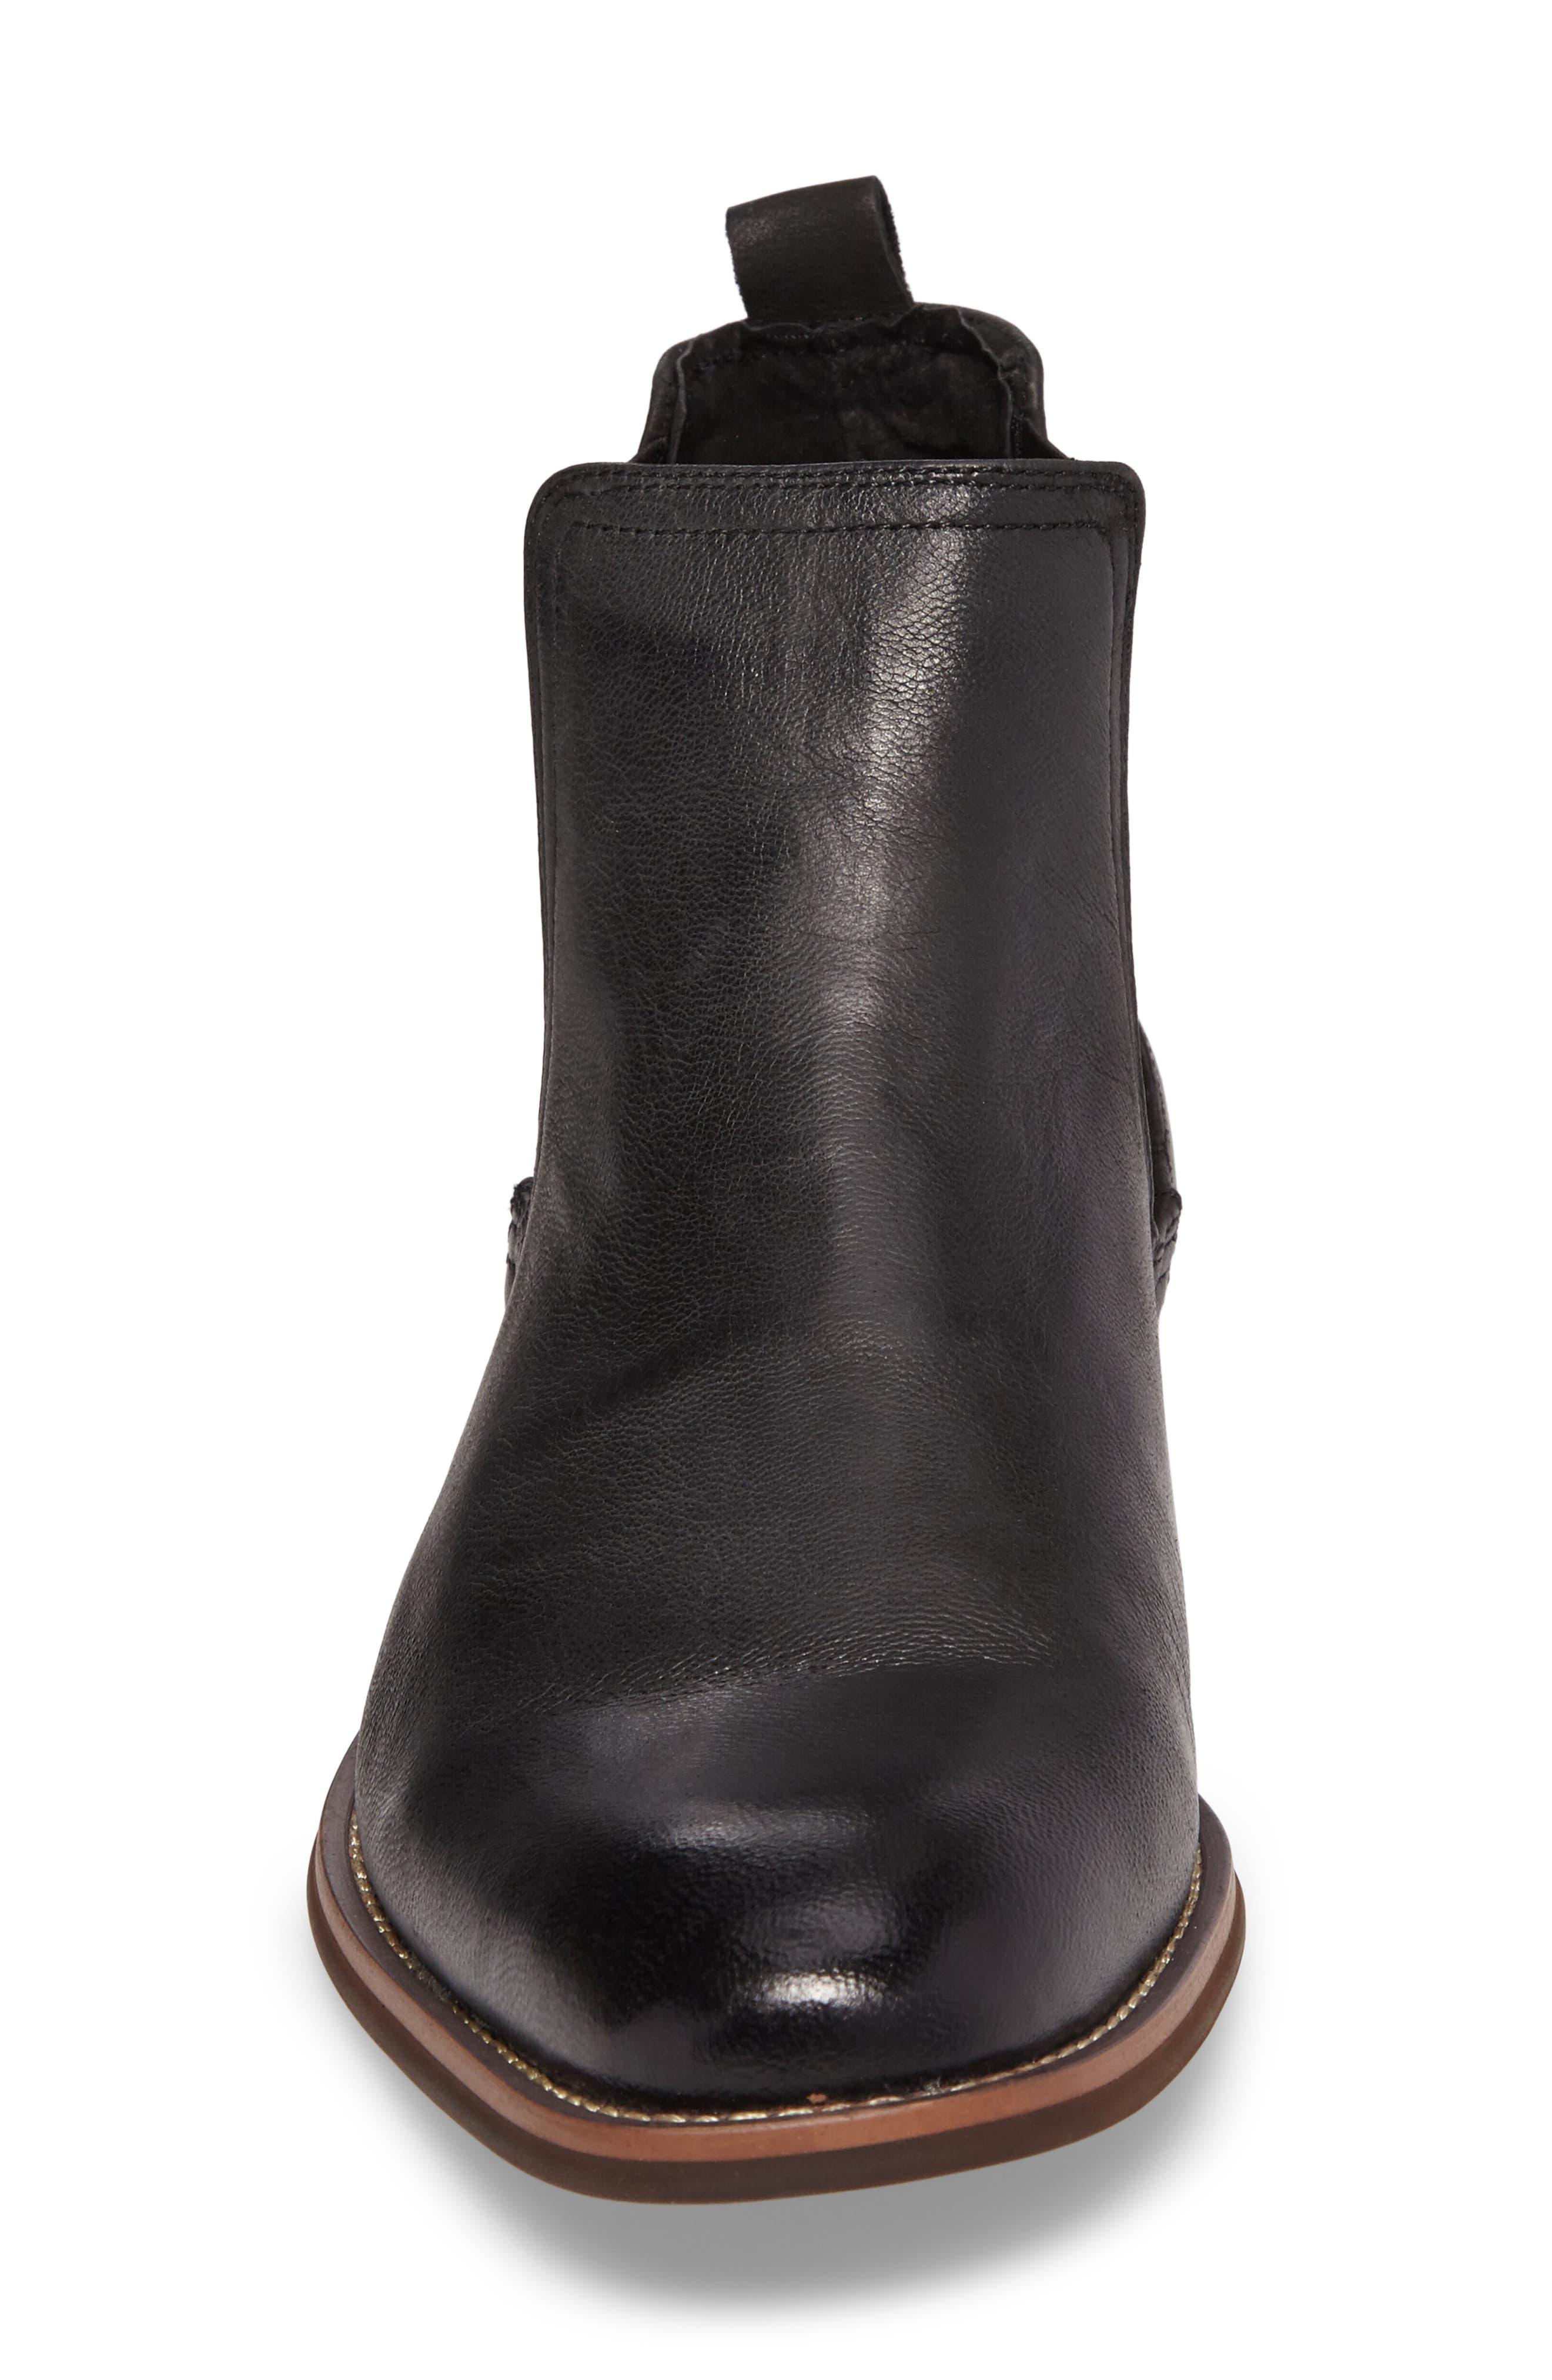 JUMP, Lawson Chelsea Boot, Alternate thumbnail 4, color, BLACK